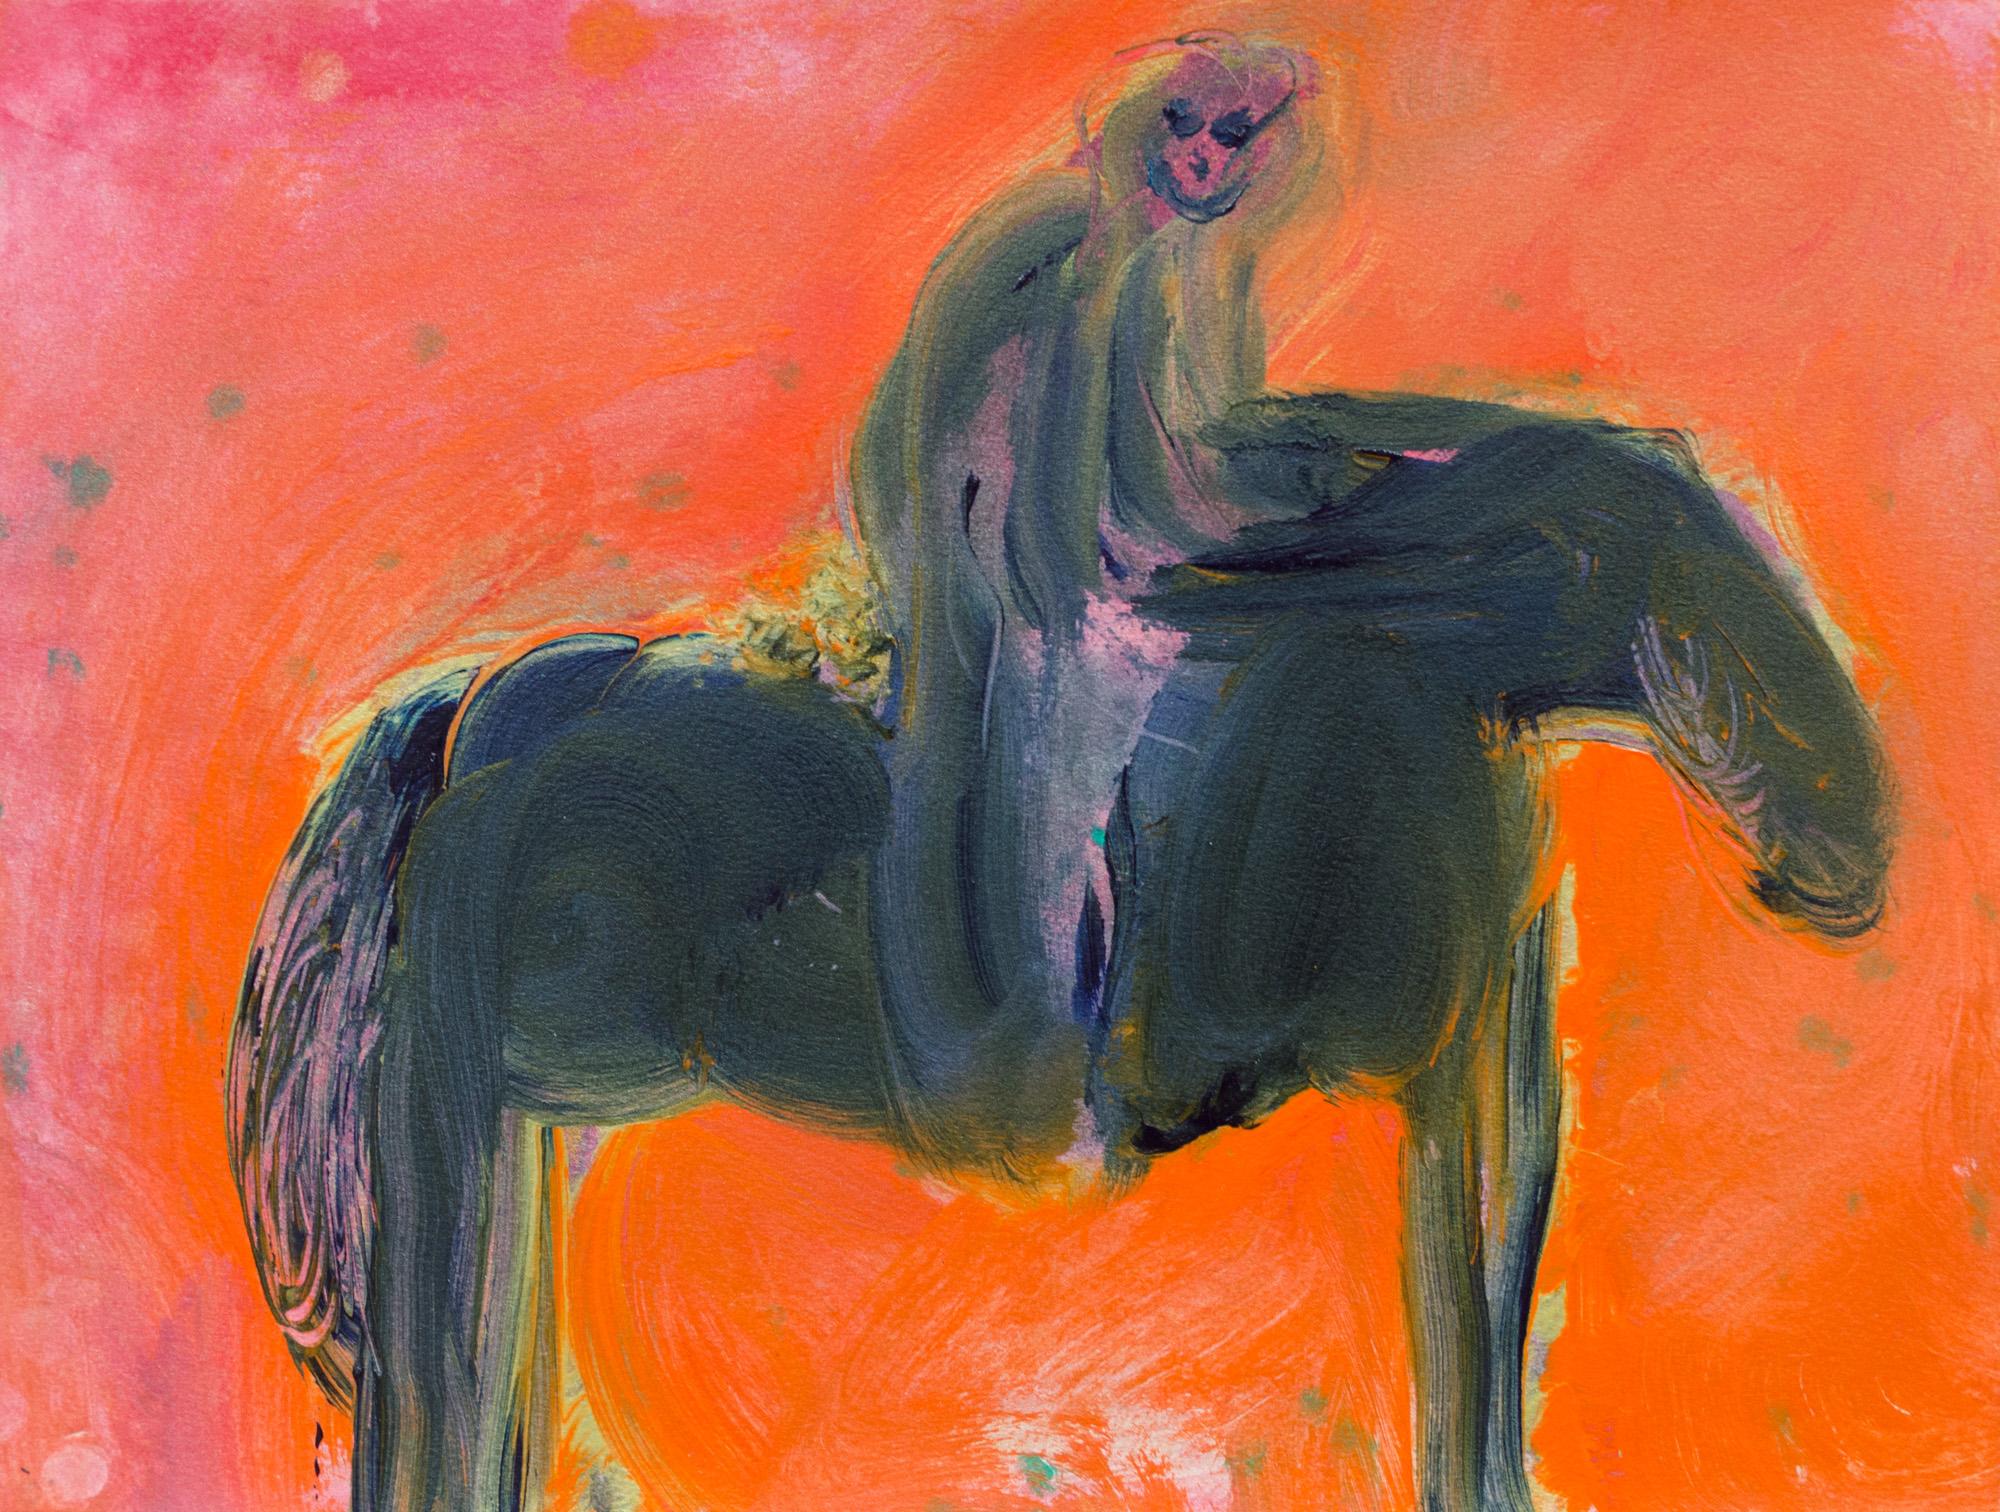 Rhys Lee, Riders, 2016, Acrylic on paper, 28 x 38cm, $700-11.jpg